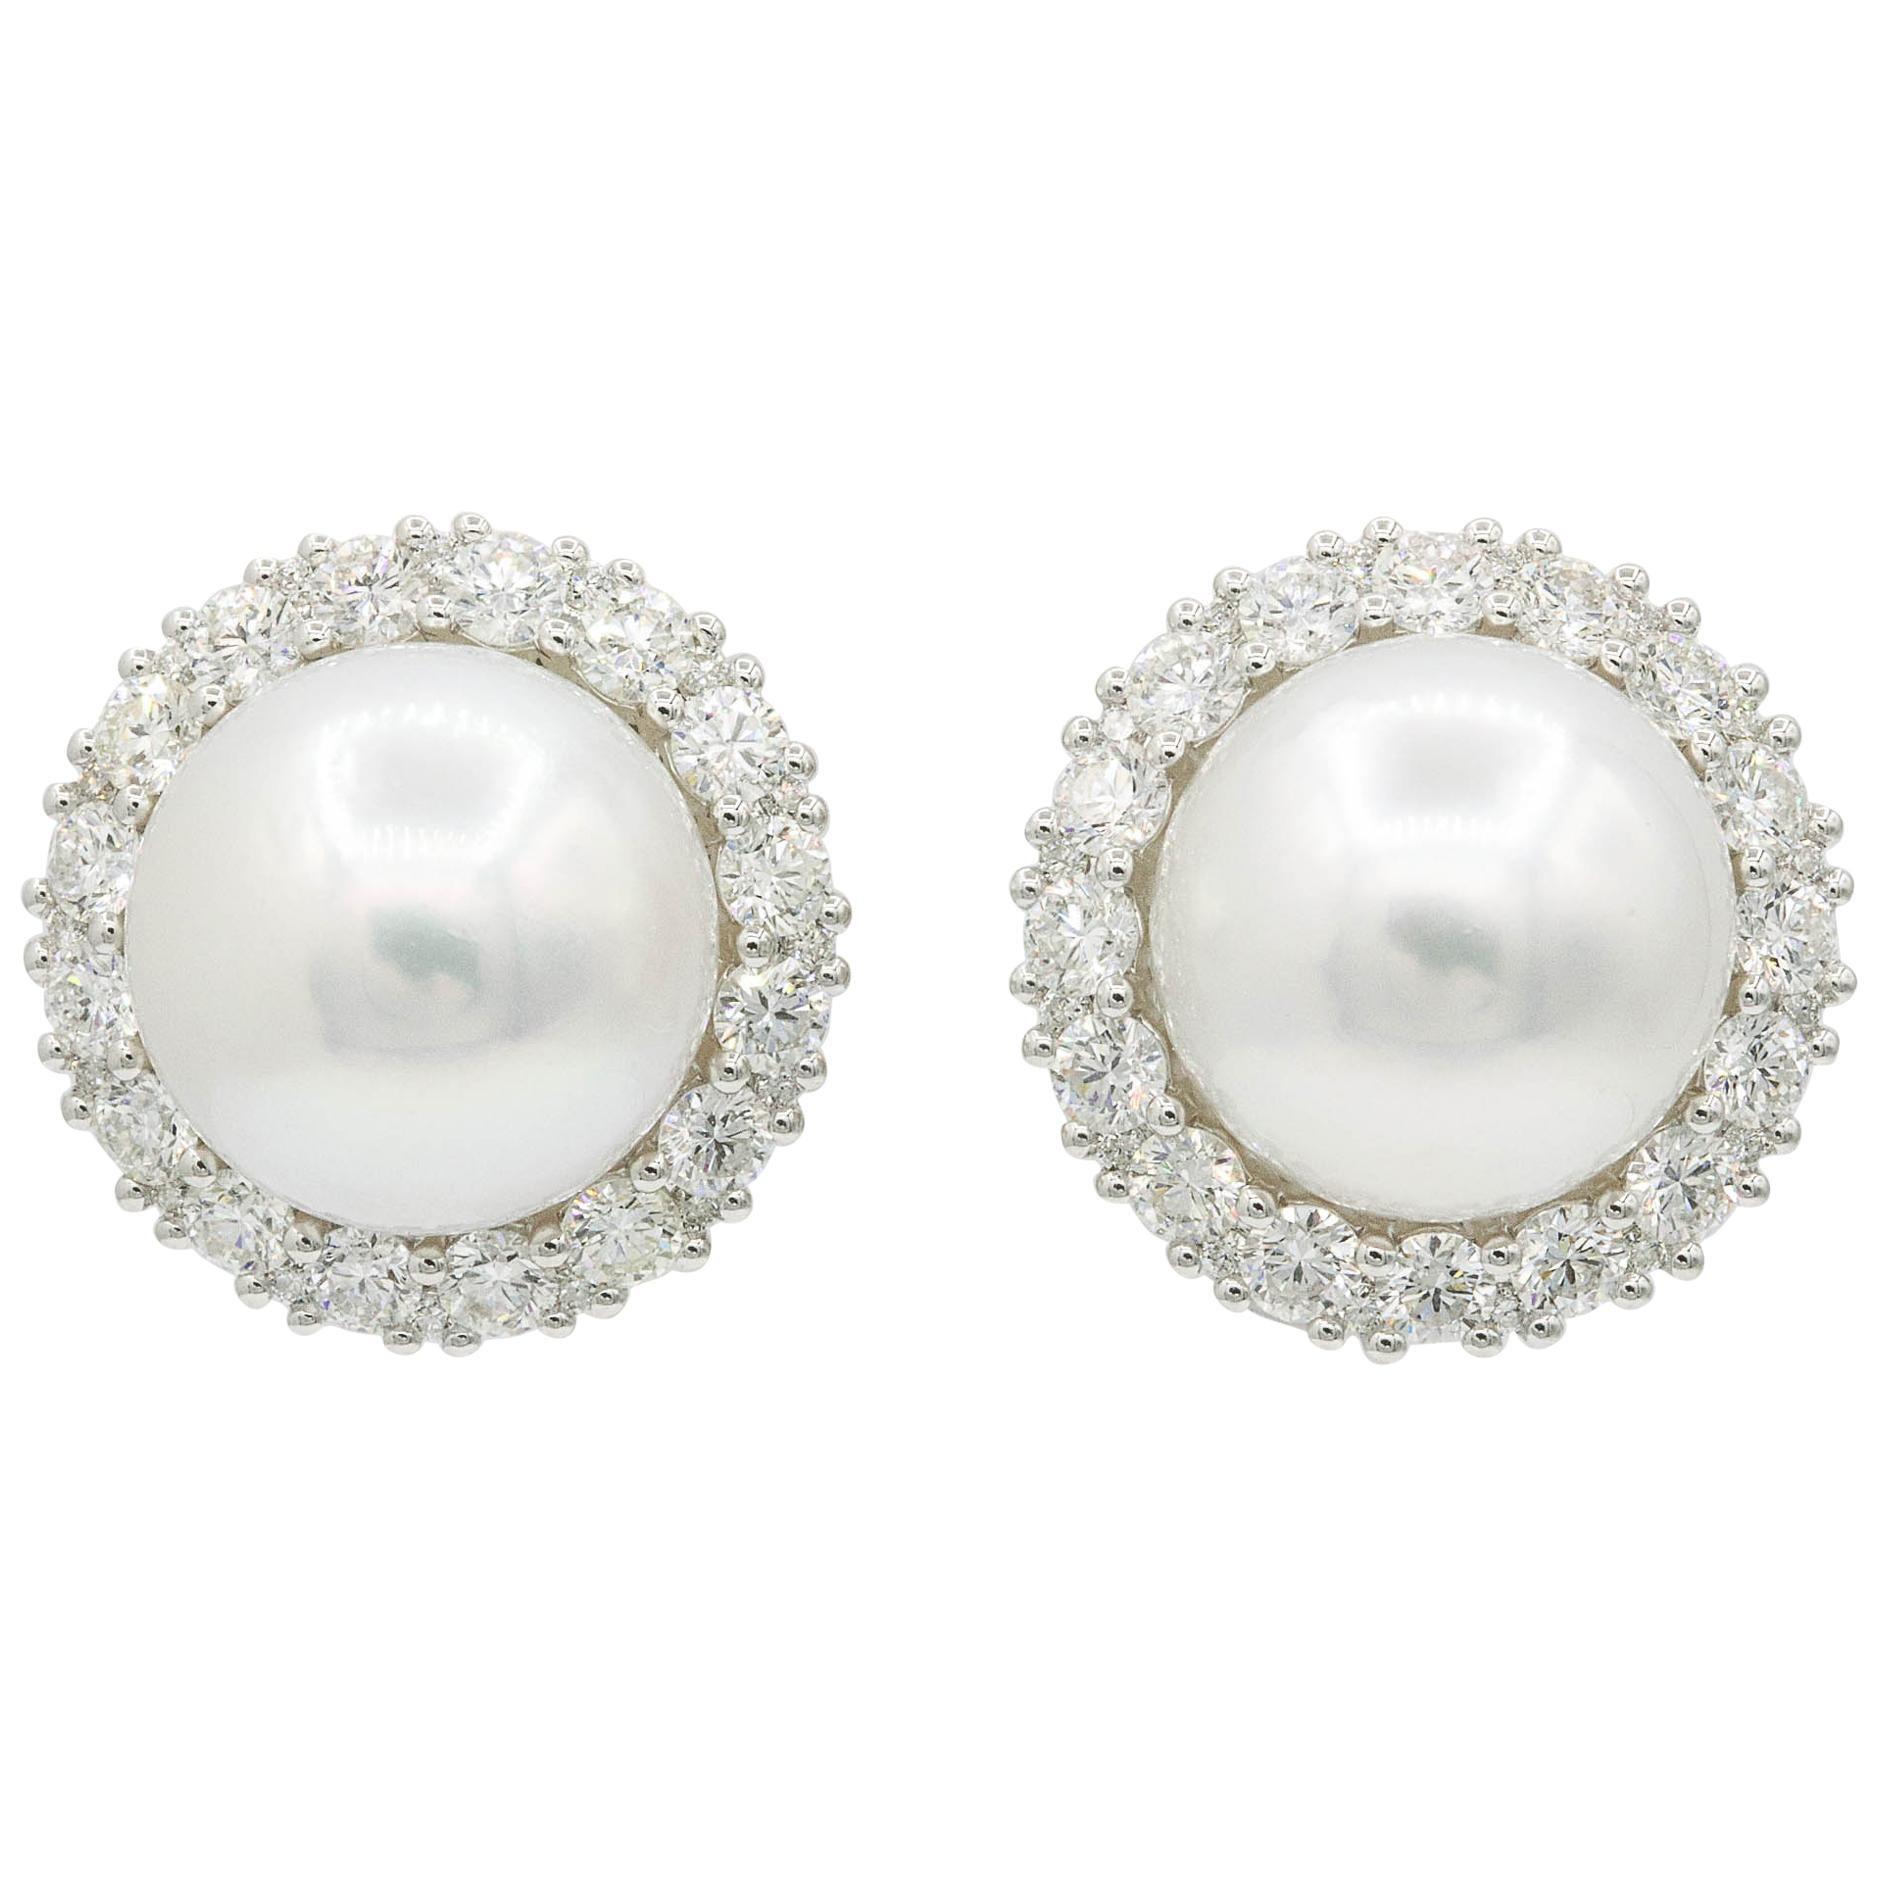 South Sea Pearl Diamond Halo Stud Earrings 2.75 Carats 18K